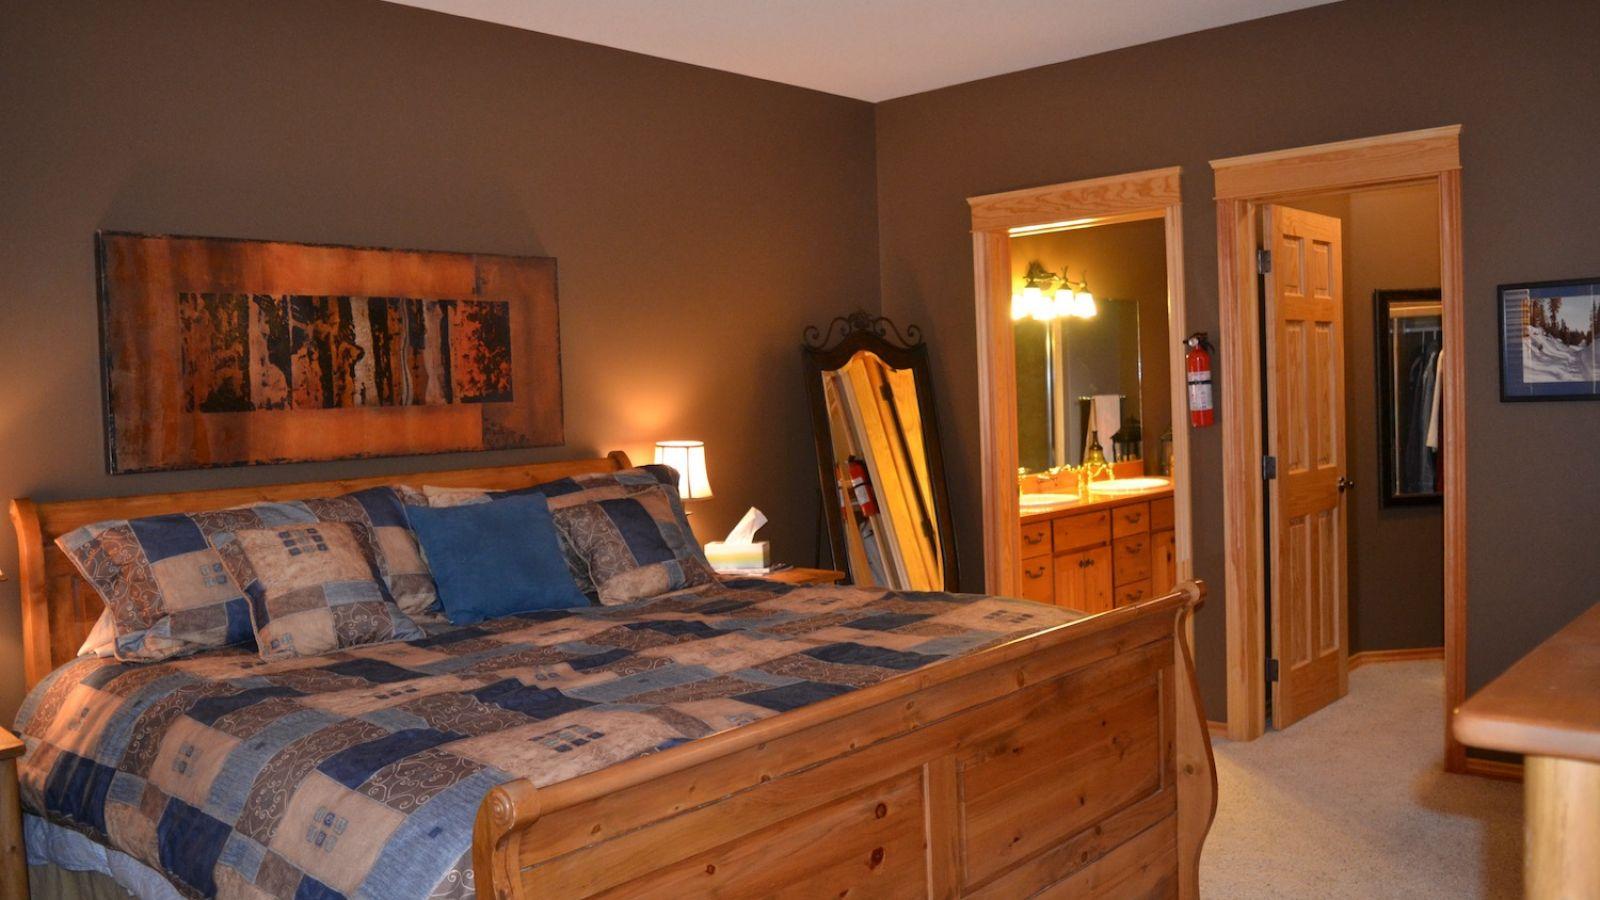 Kimberley 6 bedroom Stemwinder Chalet